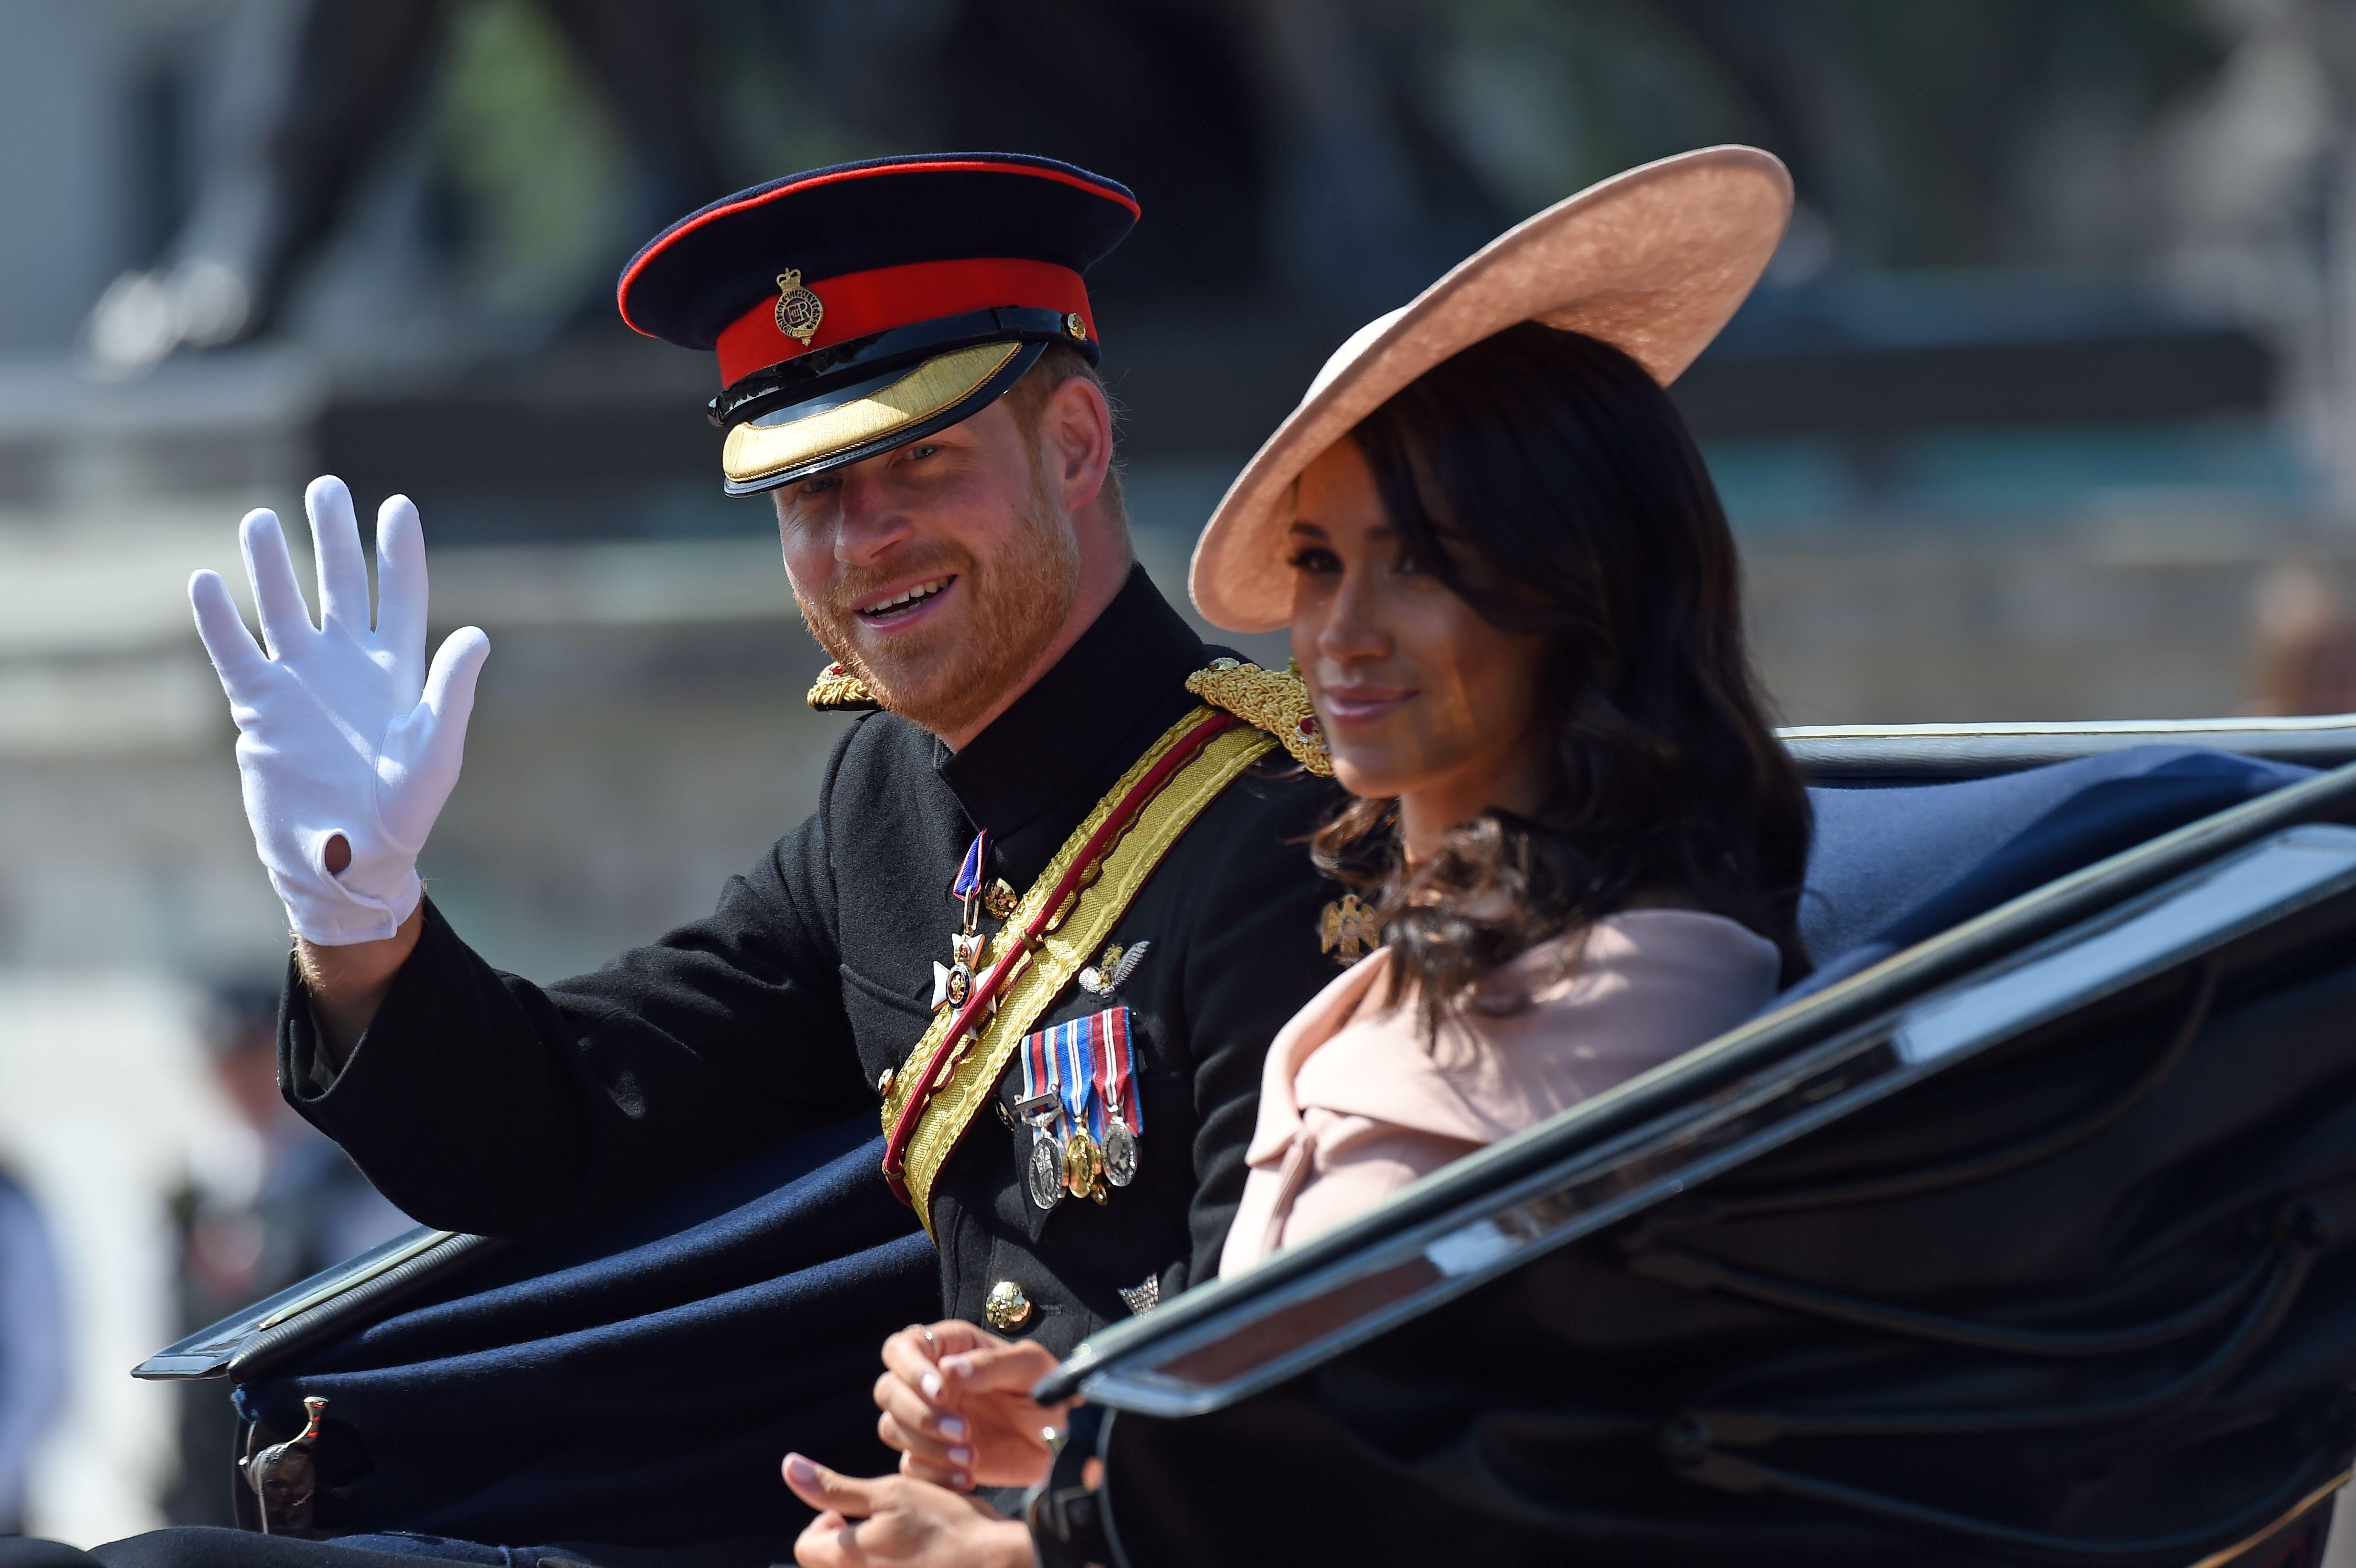 Prince Harry Reportedly Gives Meghan Markle Fashion Advice